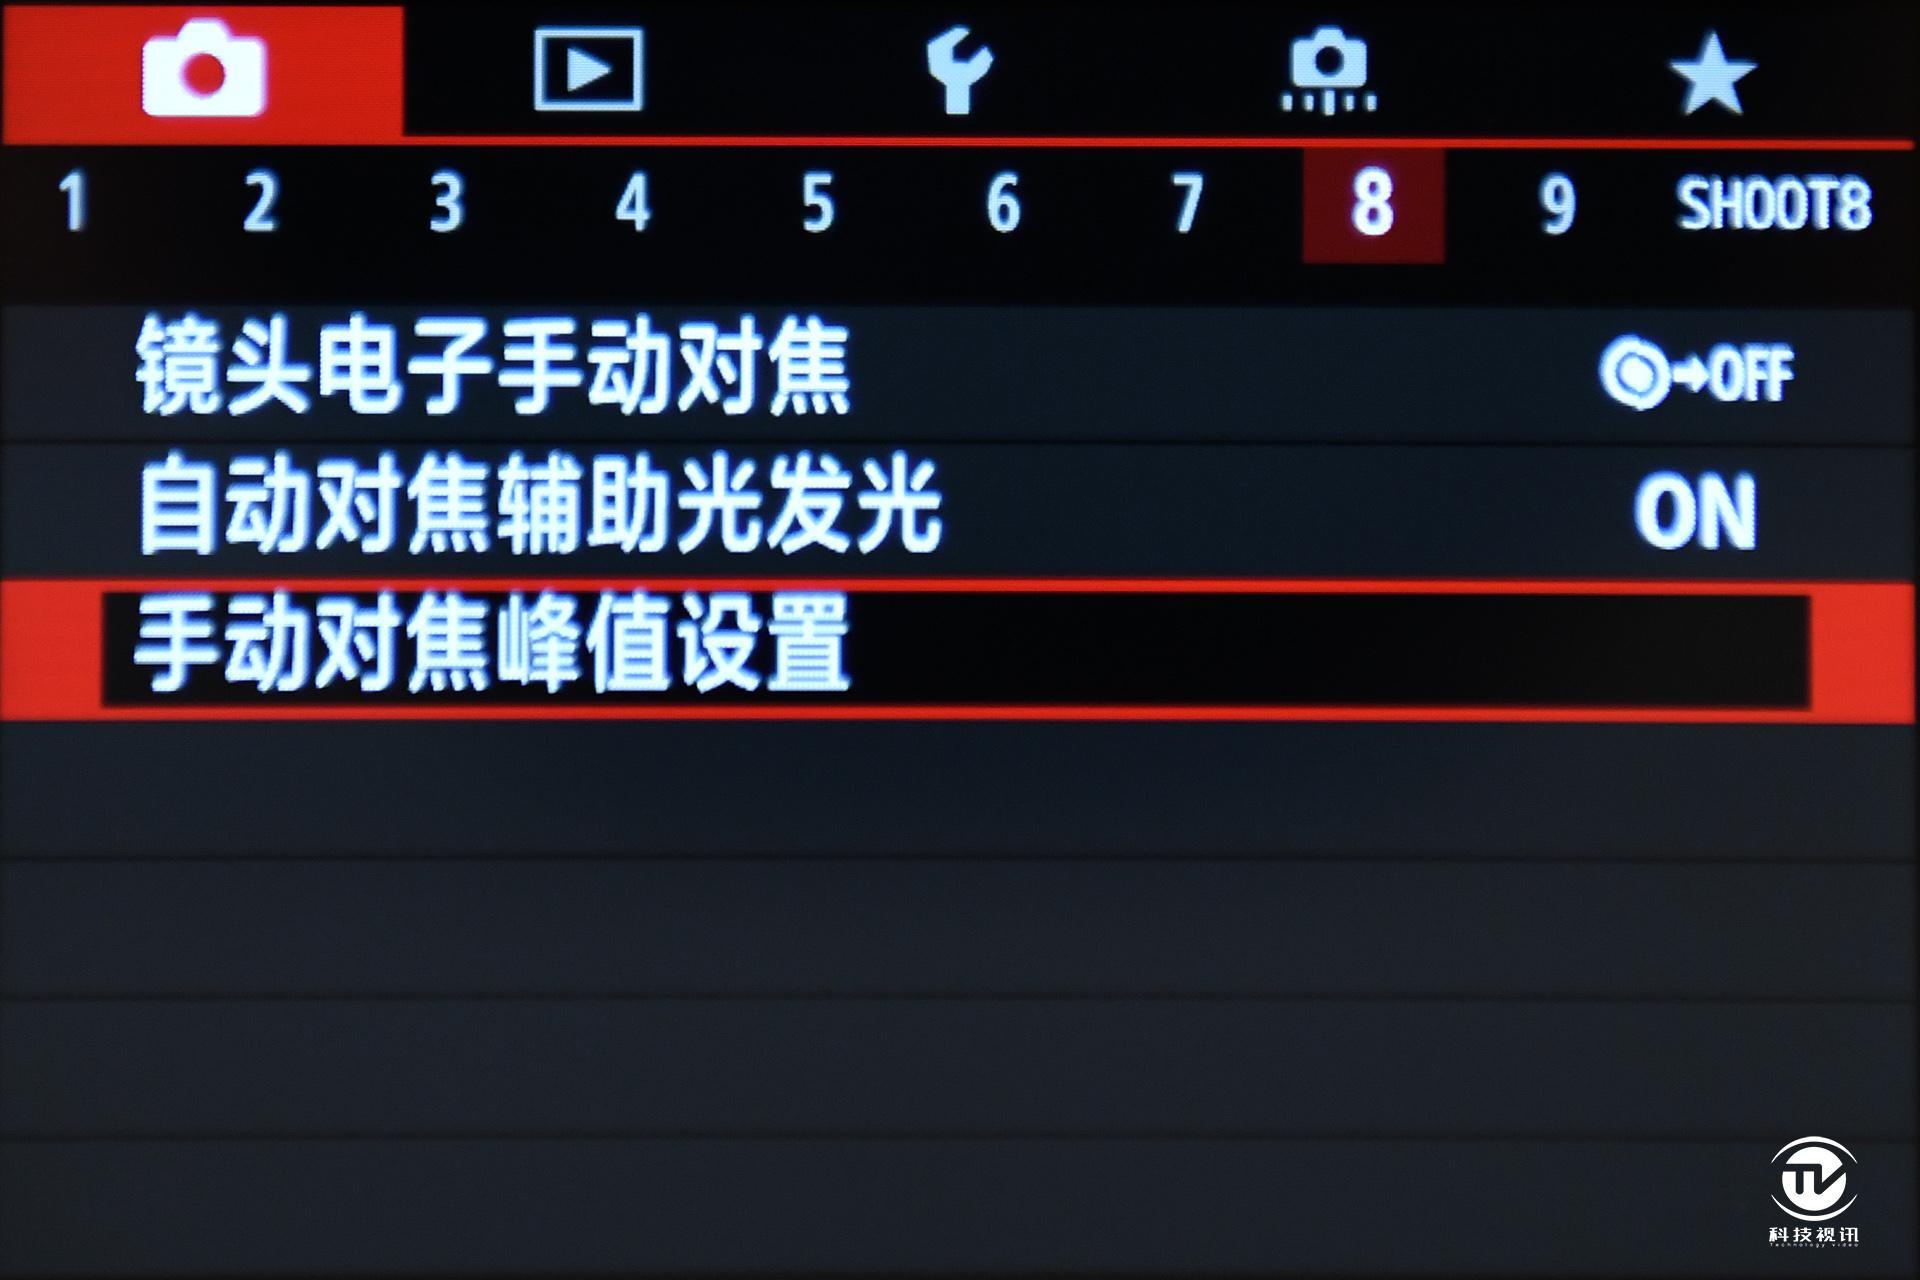 DSC_0110.JPG